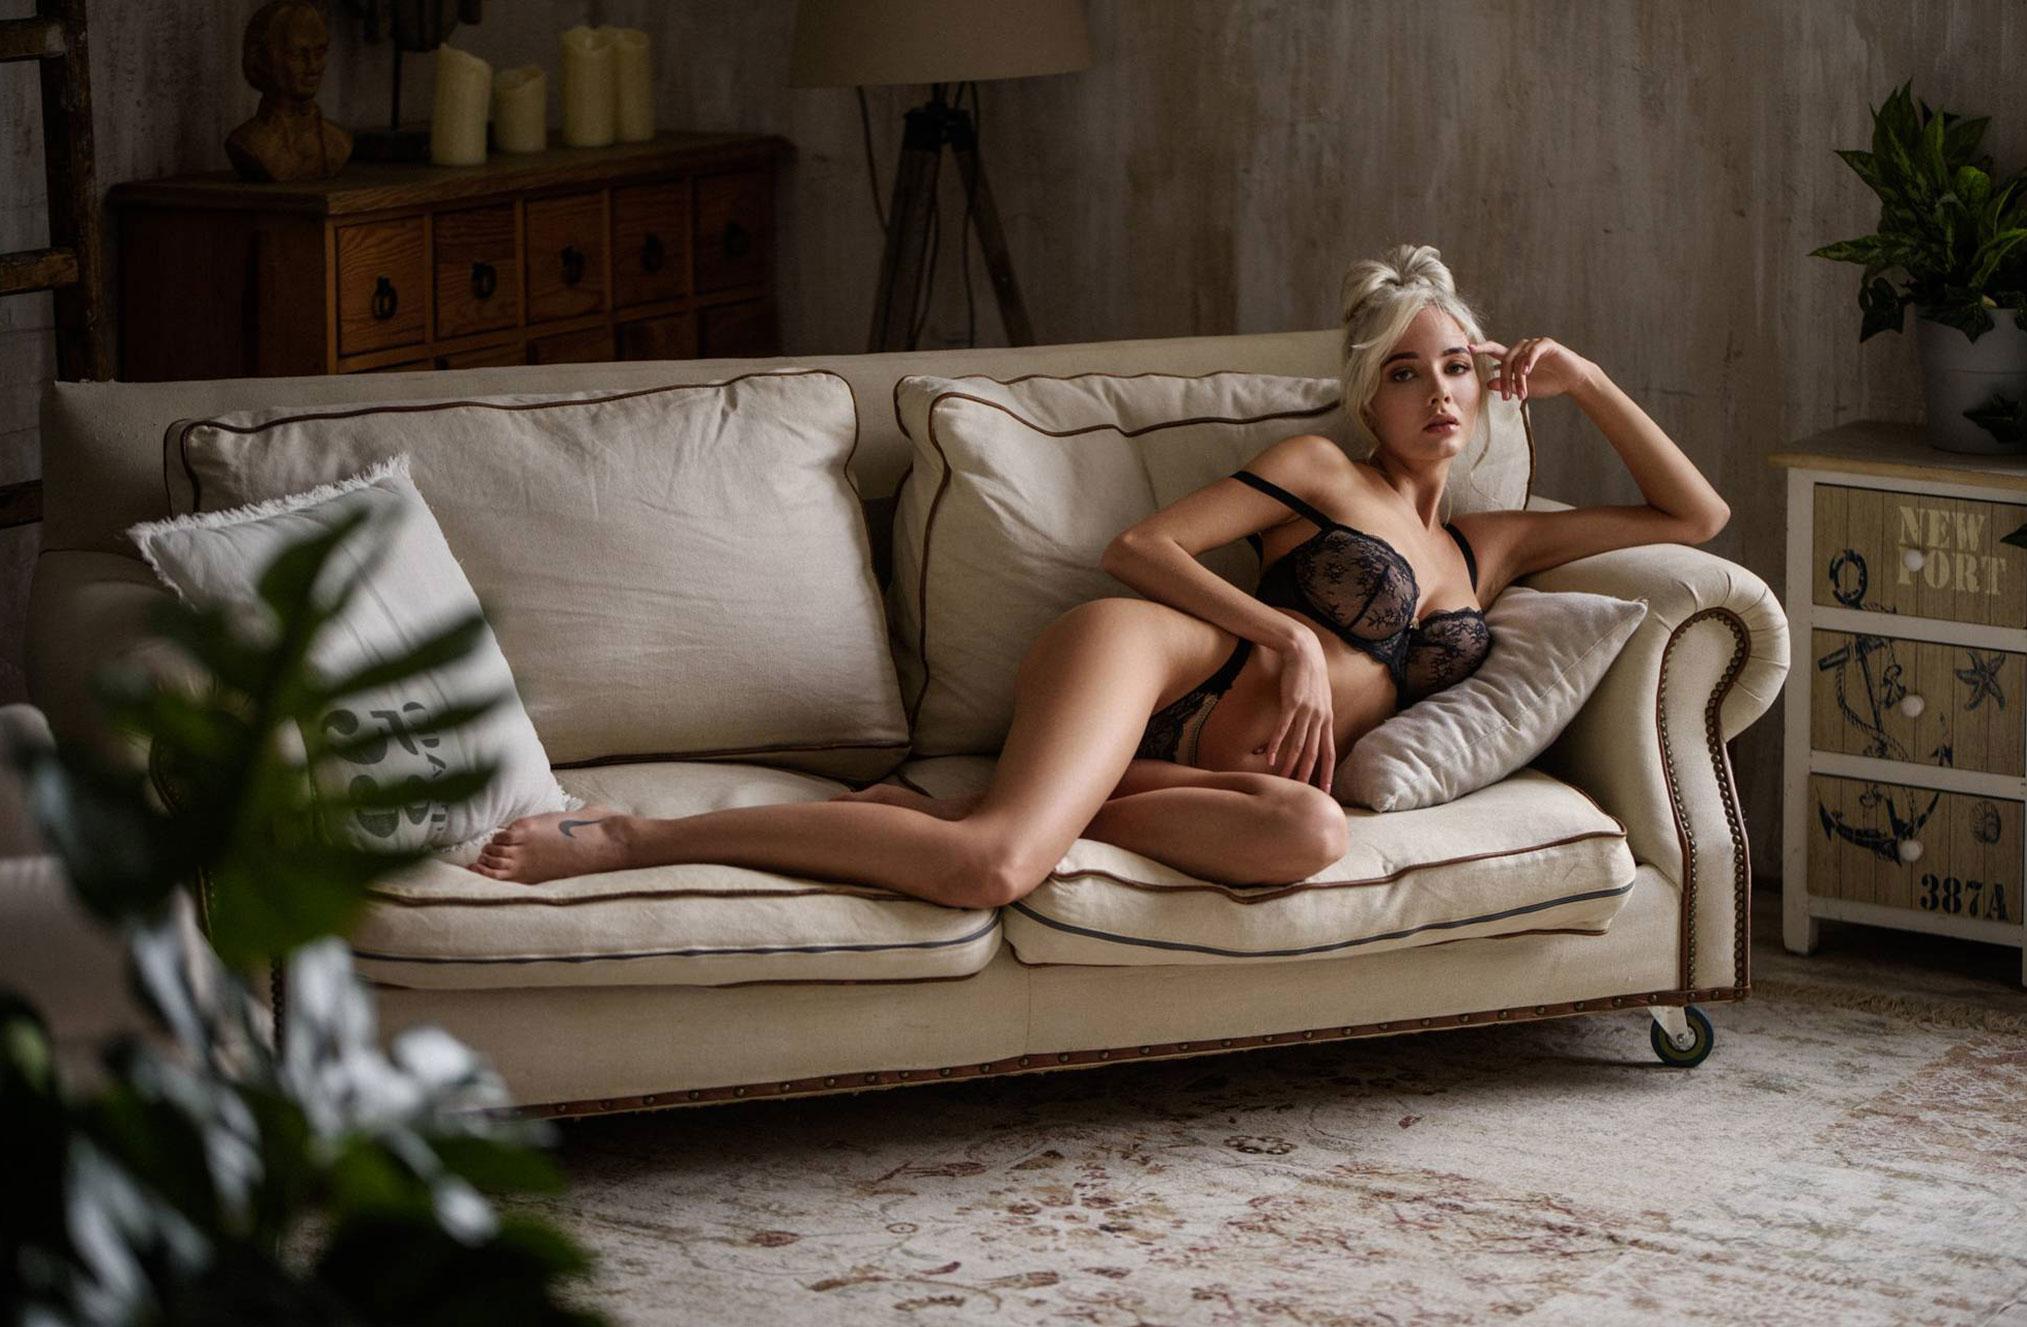 Екатерина Ширяева - голая, но в галстуке / фото 03